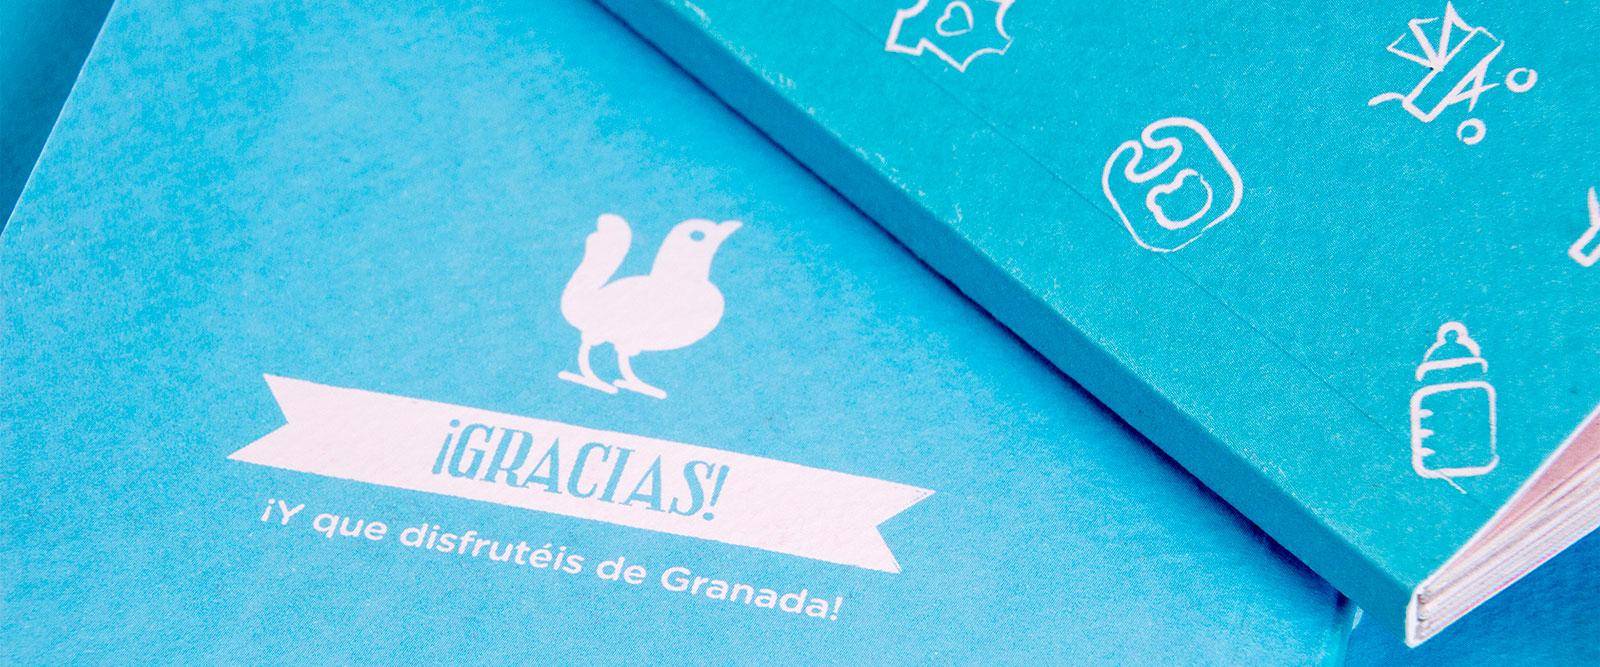 Imagen Little Granada img-total